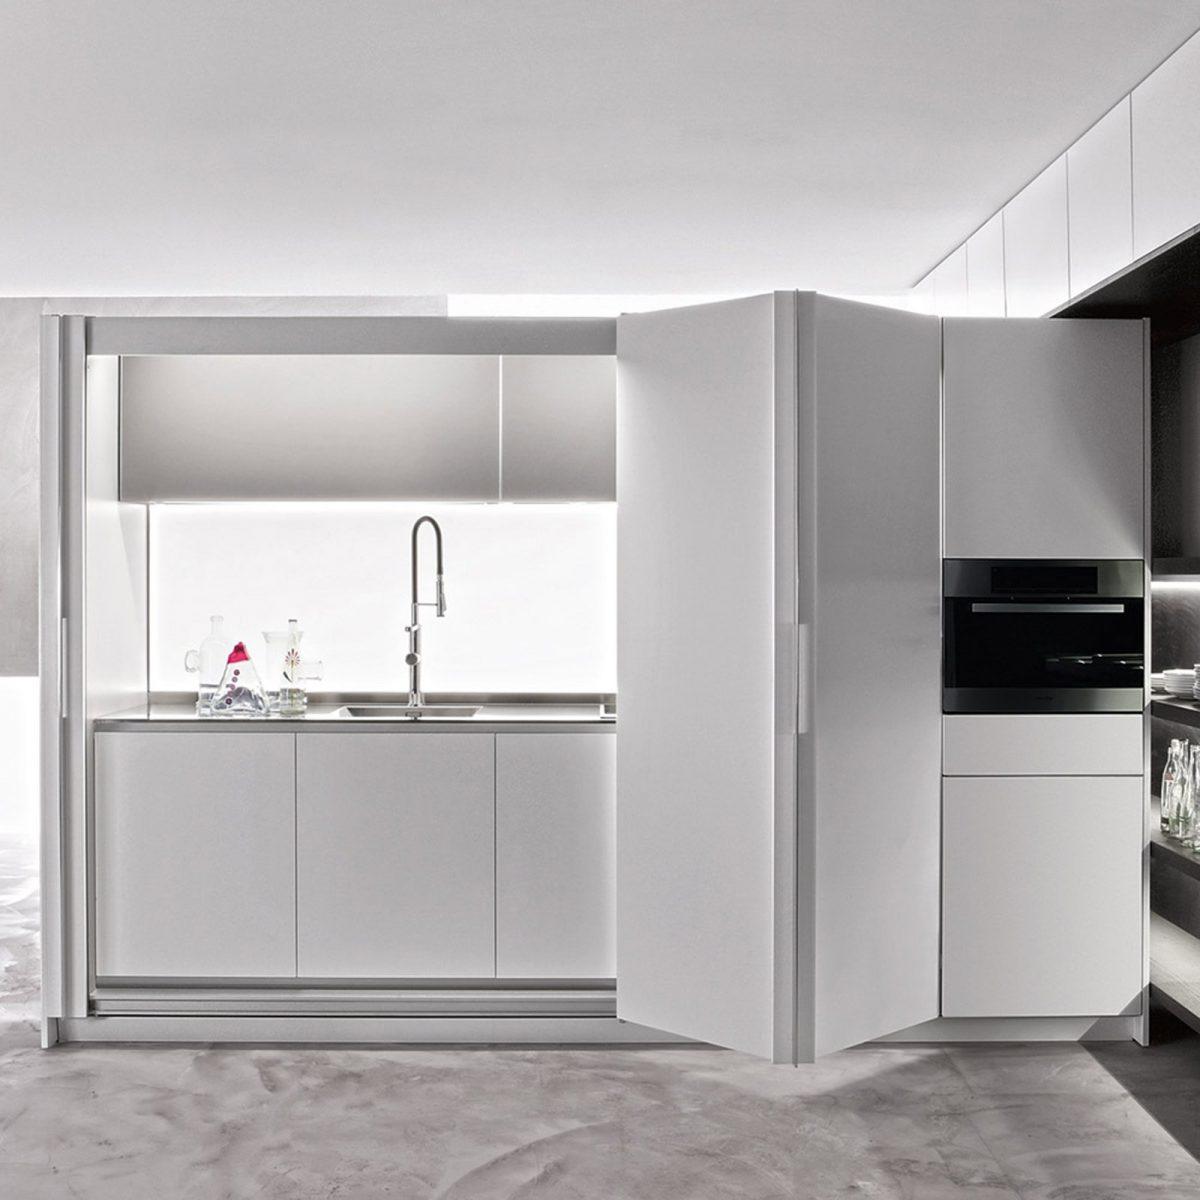 Arredare cucina piccola - Cucina armadio ikea ...